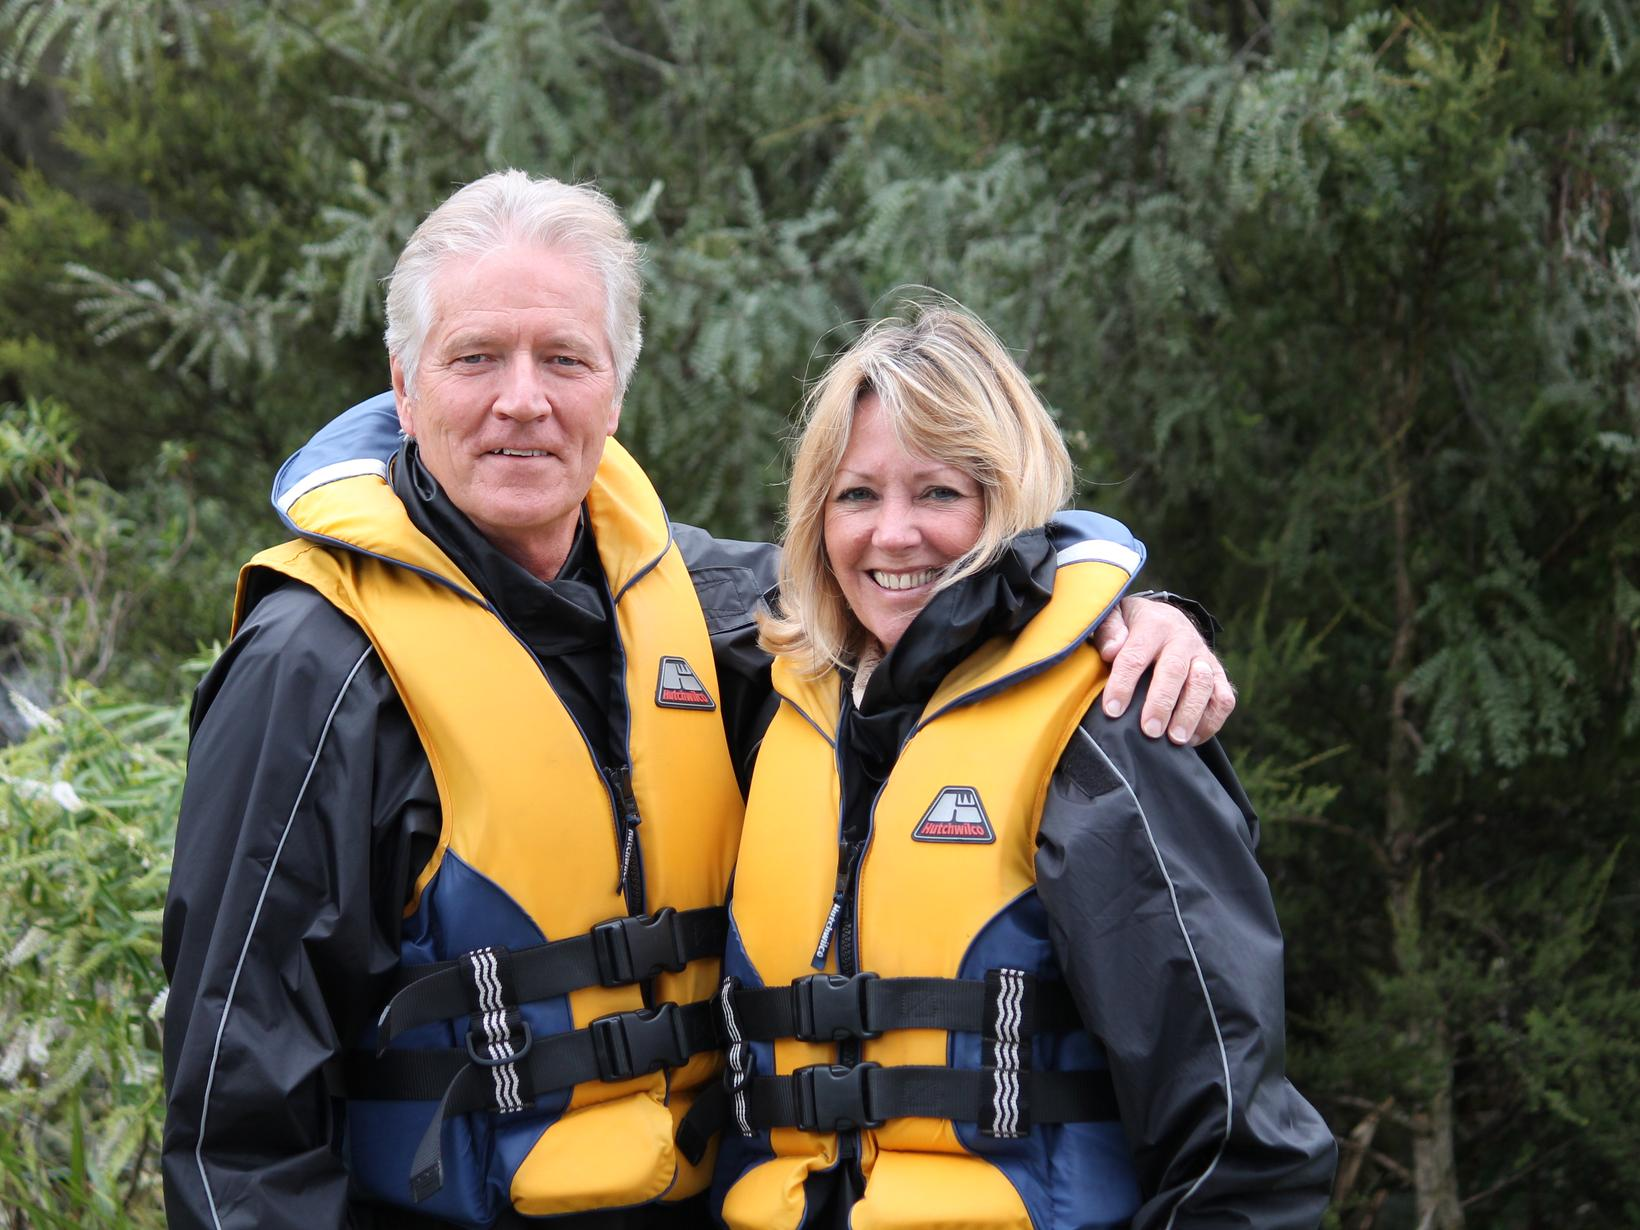 Janny & John from Perth, Western Australia, Australia